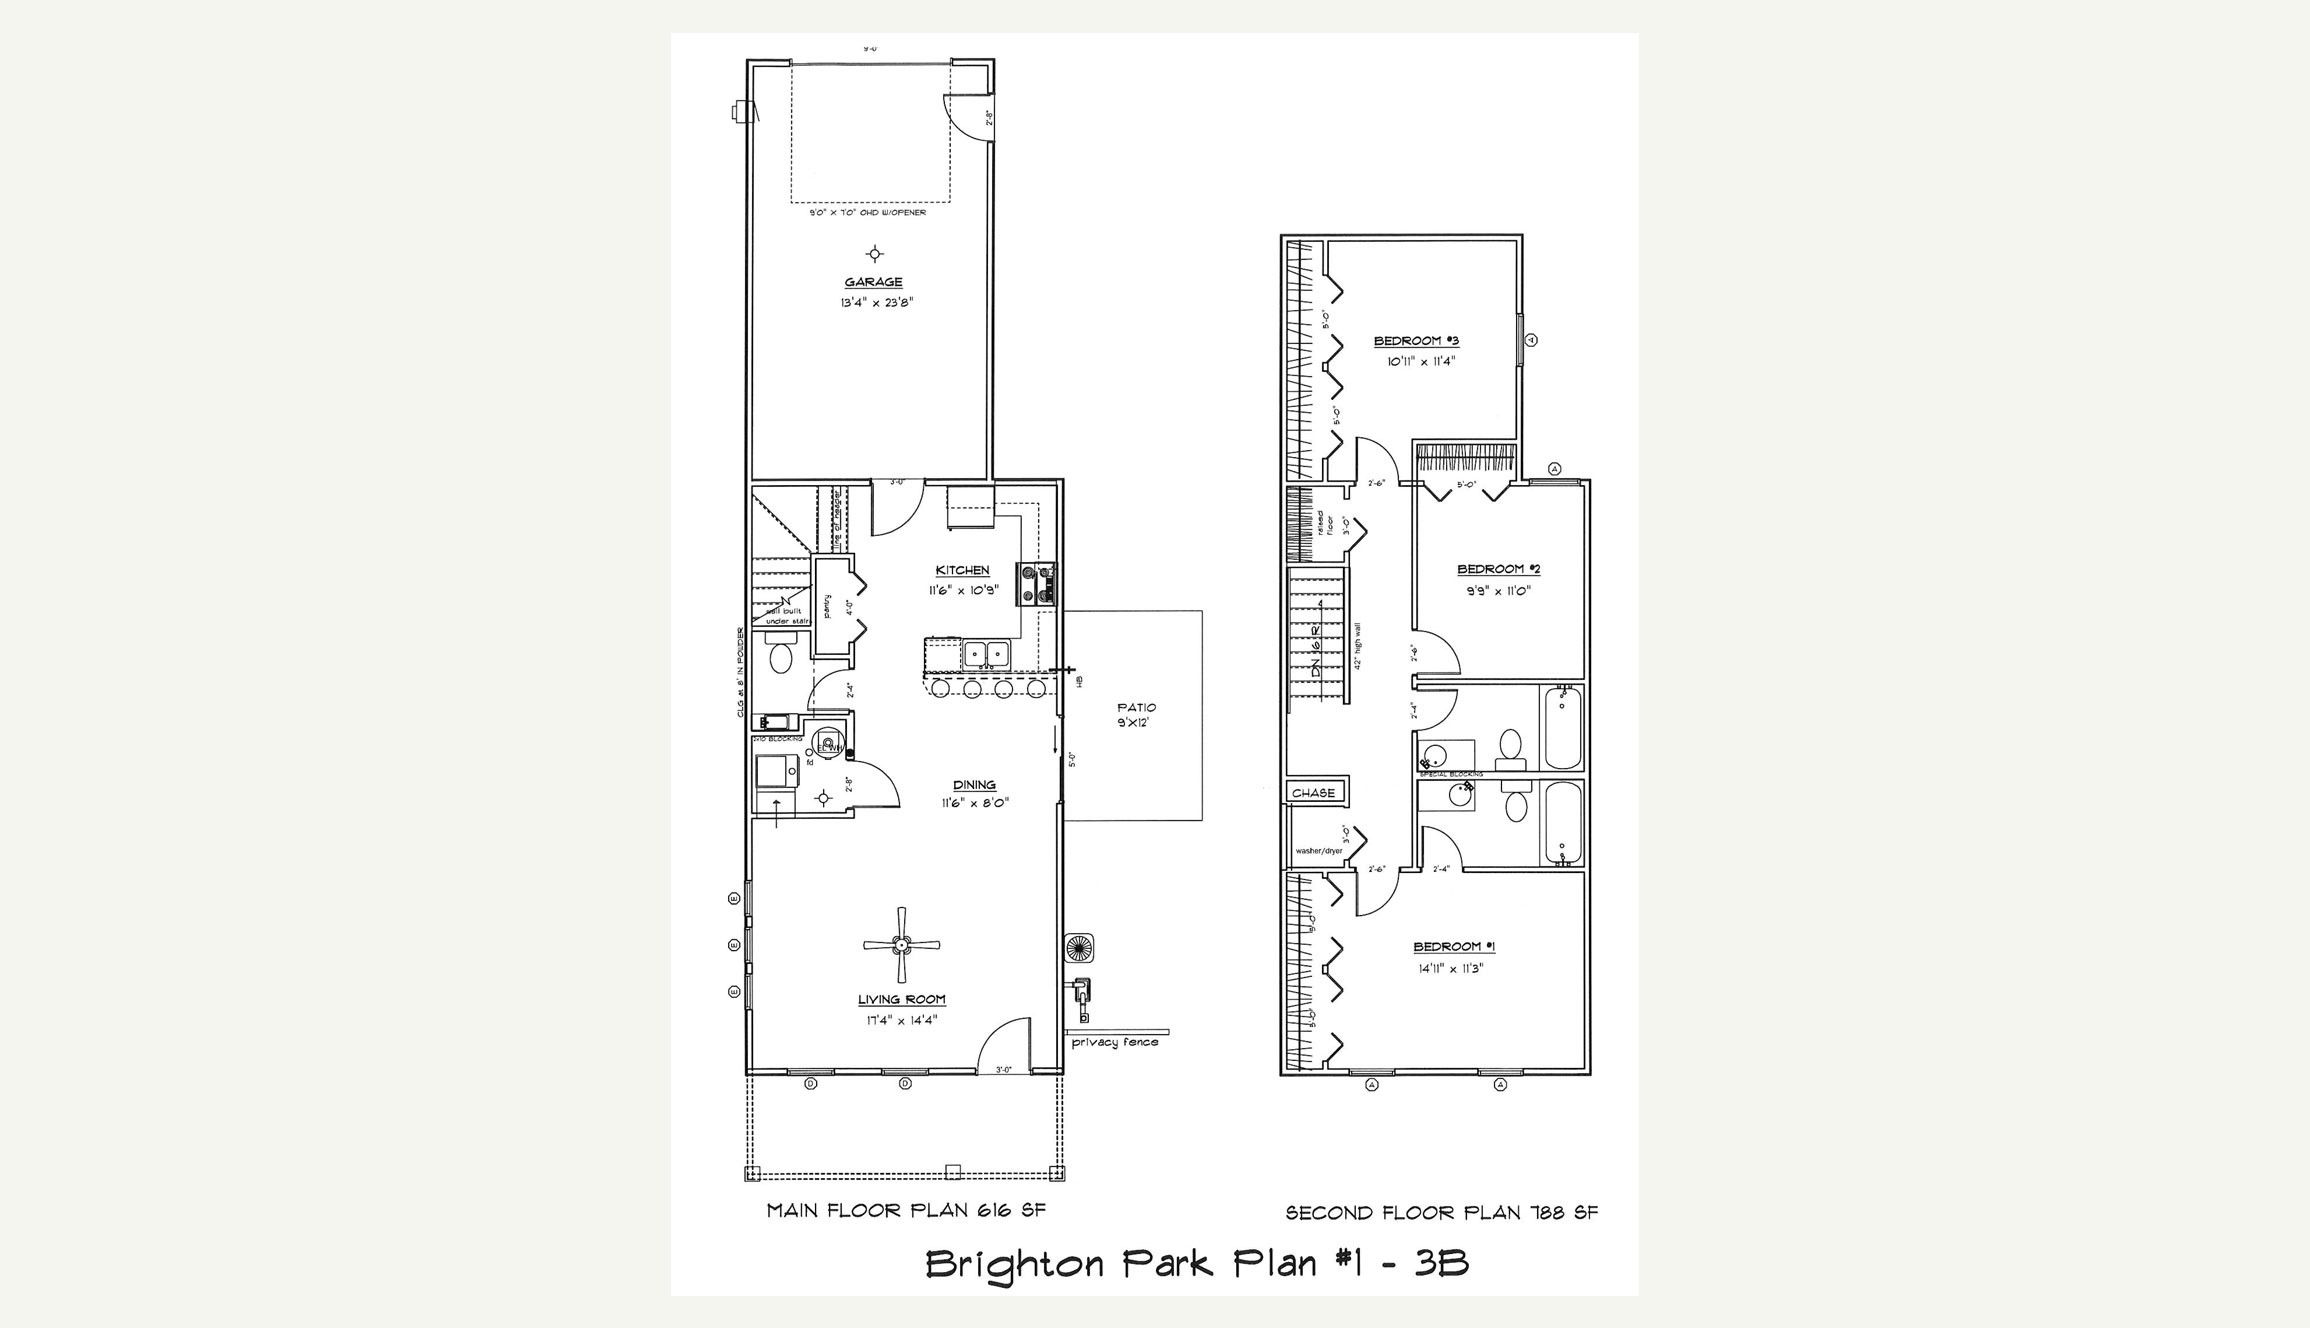 SALewis-BrightonPark-Plan1-3B-Floorplan.jpg